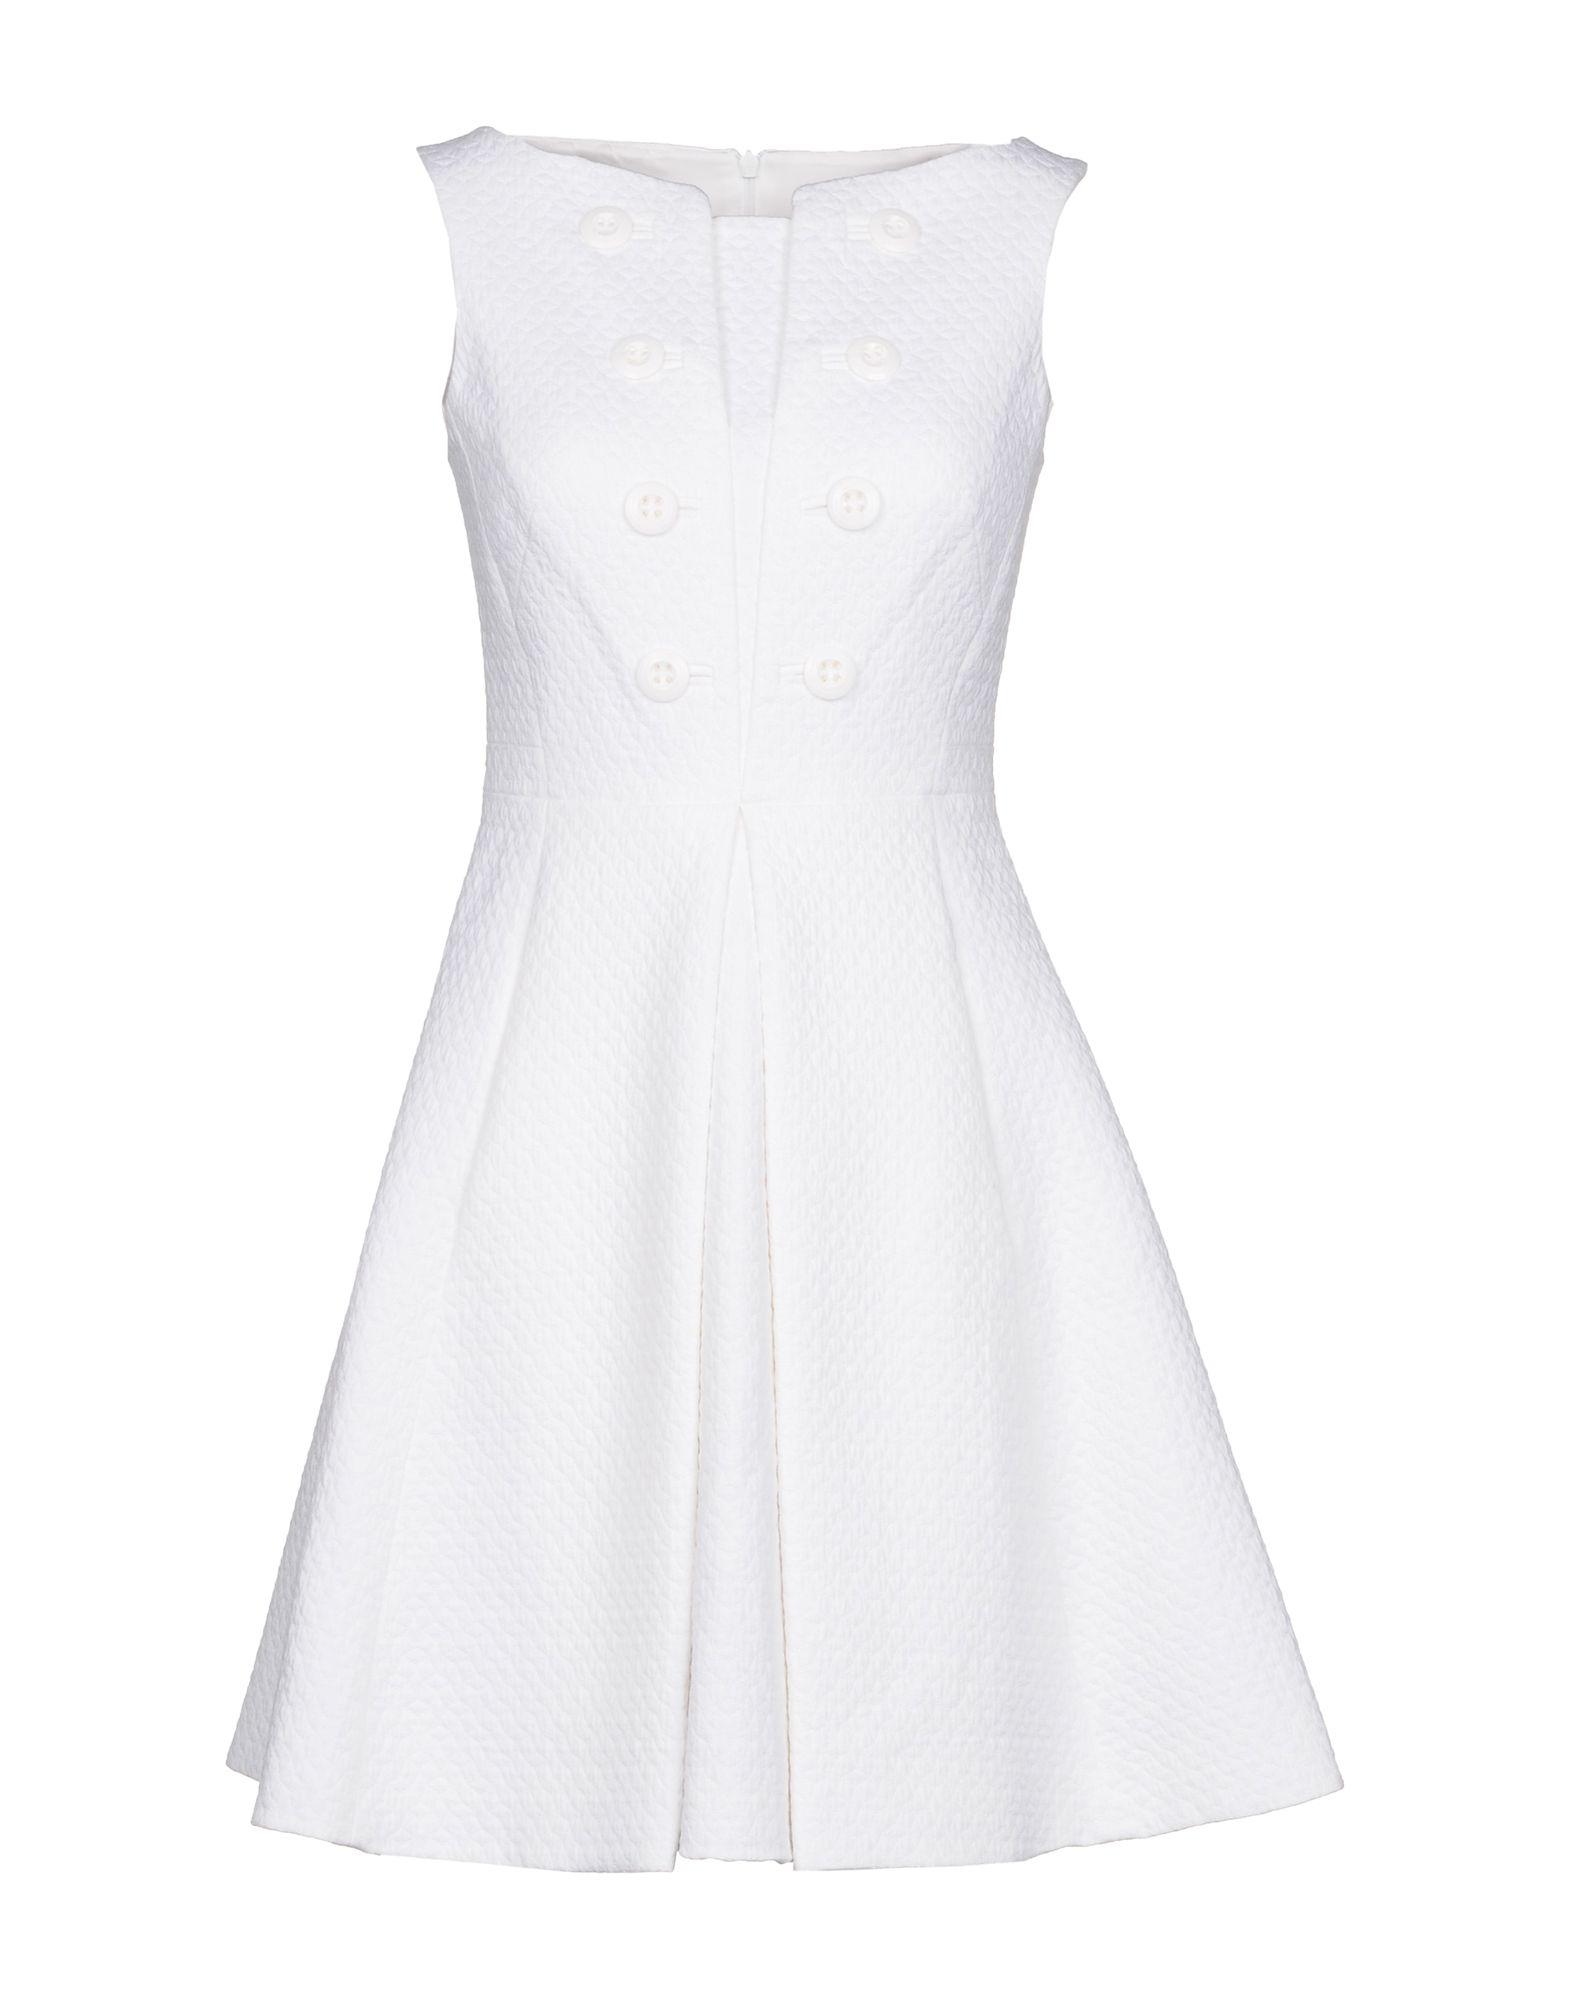 Vestito Corto Karen Millen Donna - Acquista online su tzCkeg